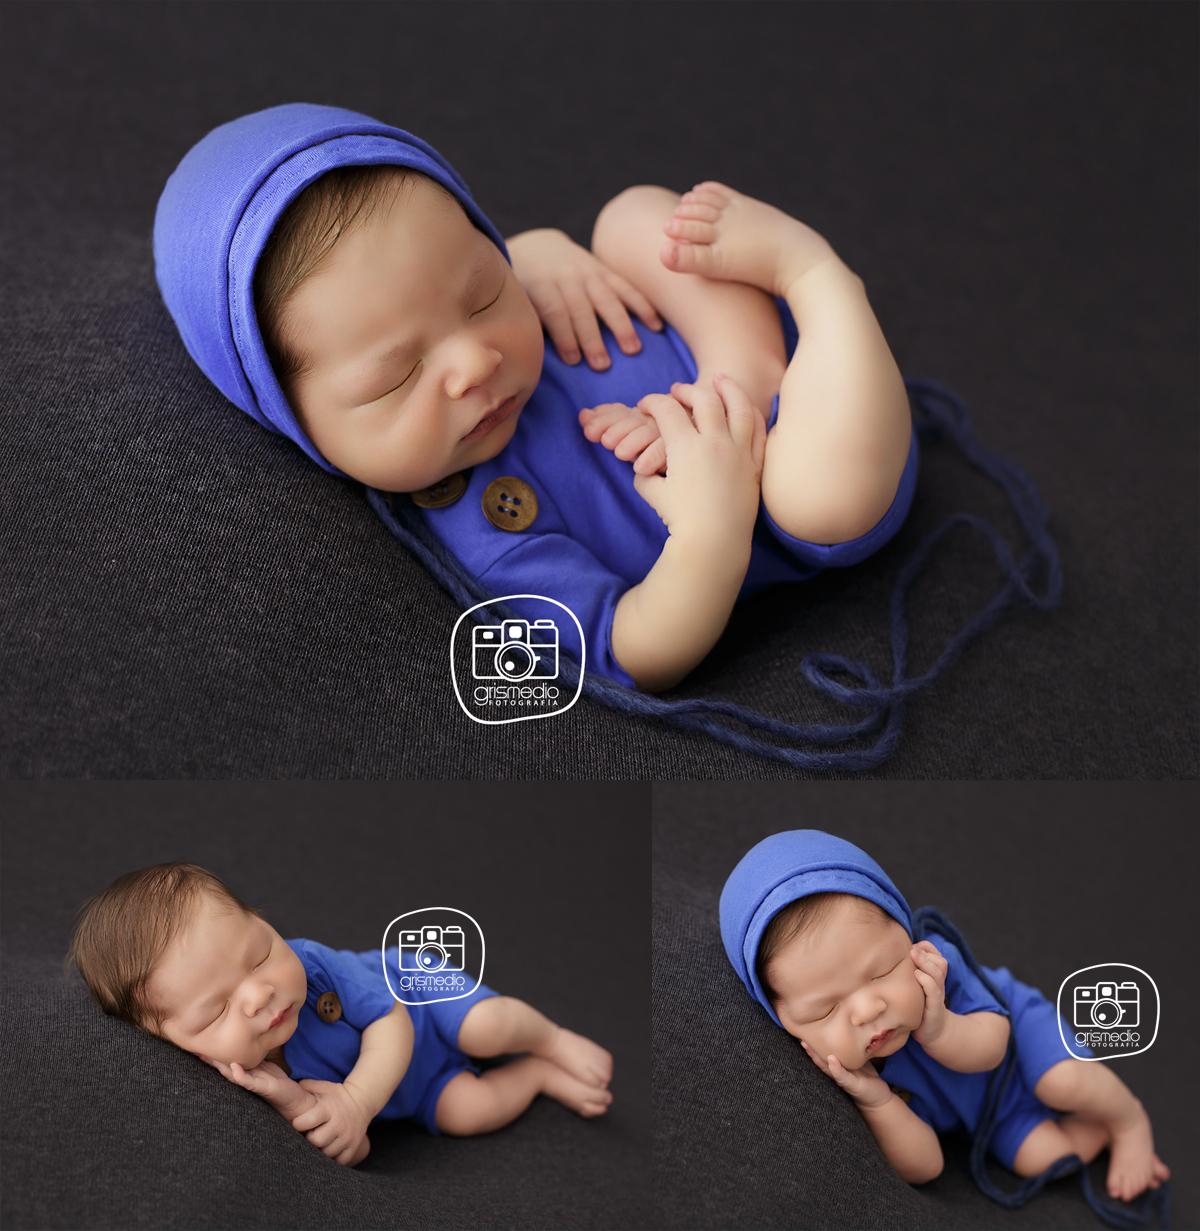 reportaje-recien-nacido-newborn-zaragoza